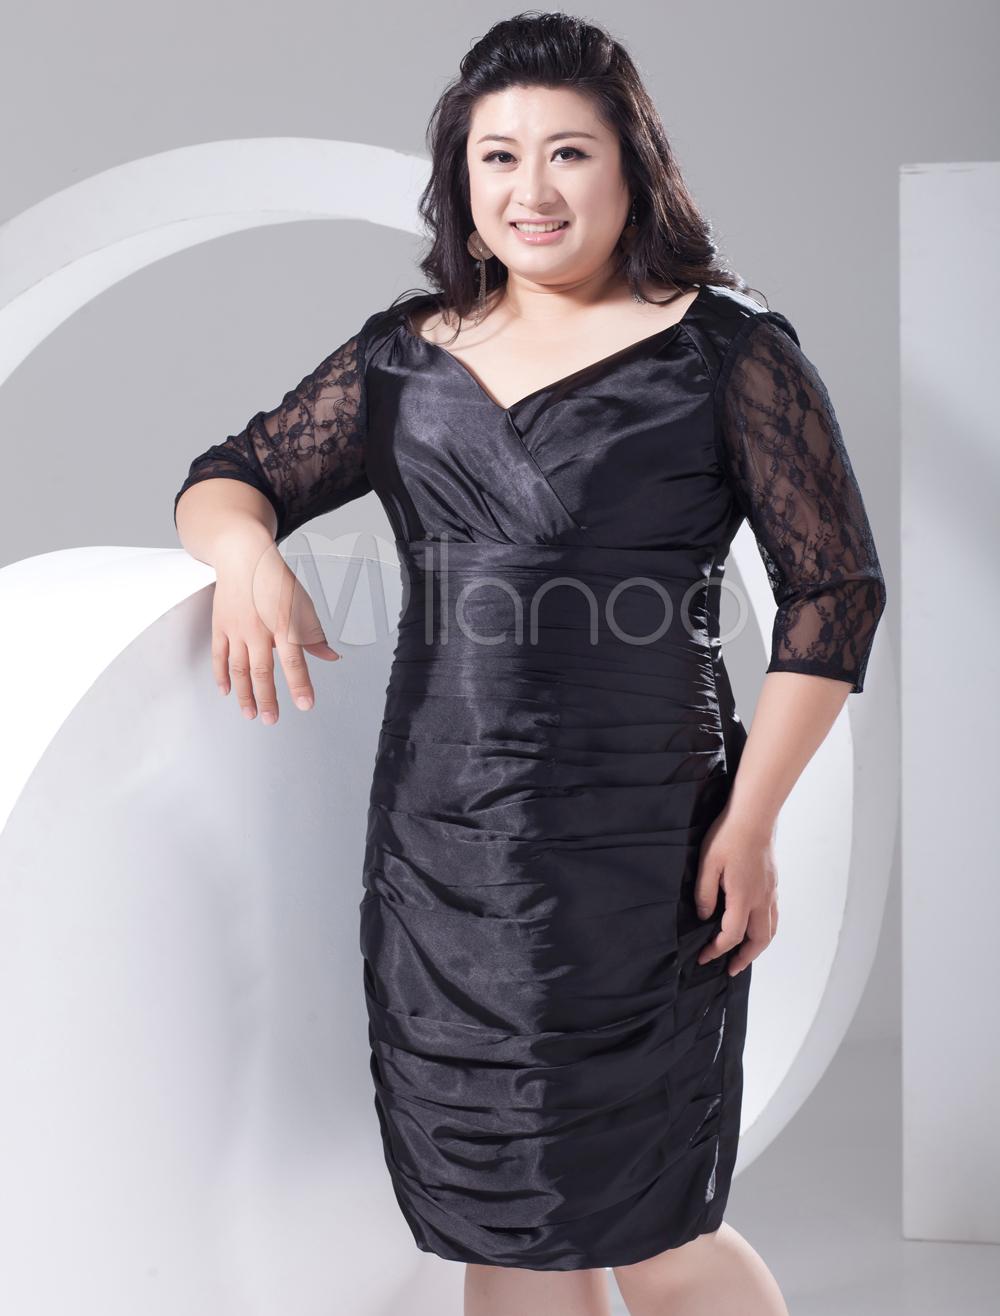 2013 Style Sheath Dark Navy Chiffon Plus Size Cocktail Dress